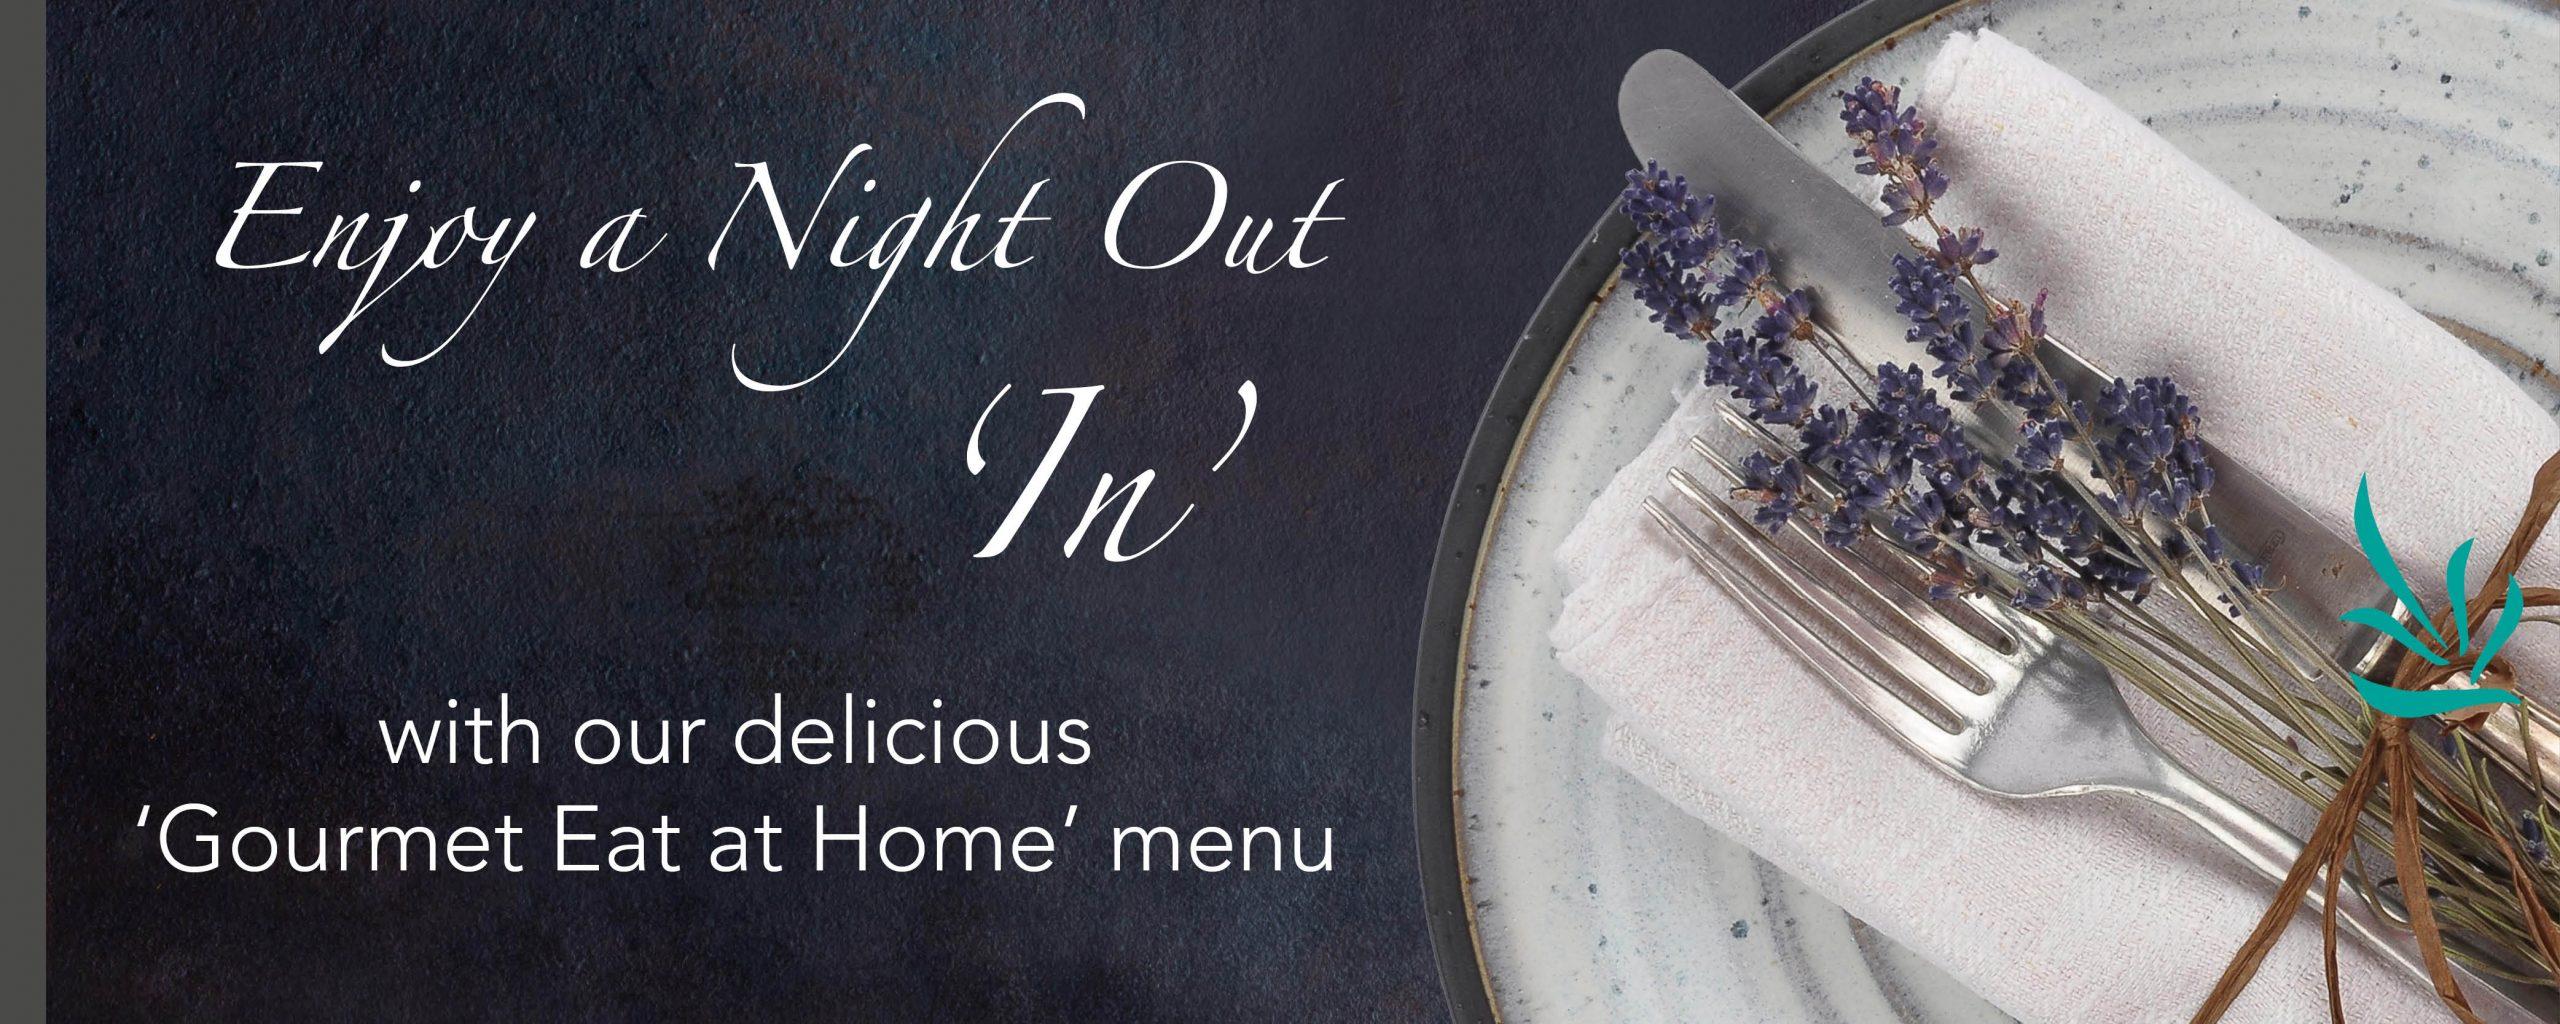 New Gourmet menu page slider